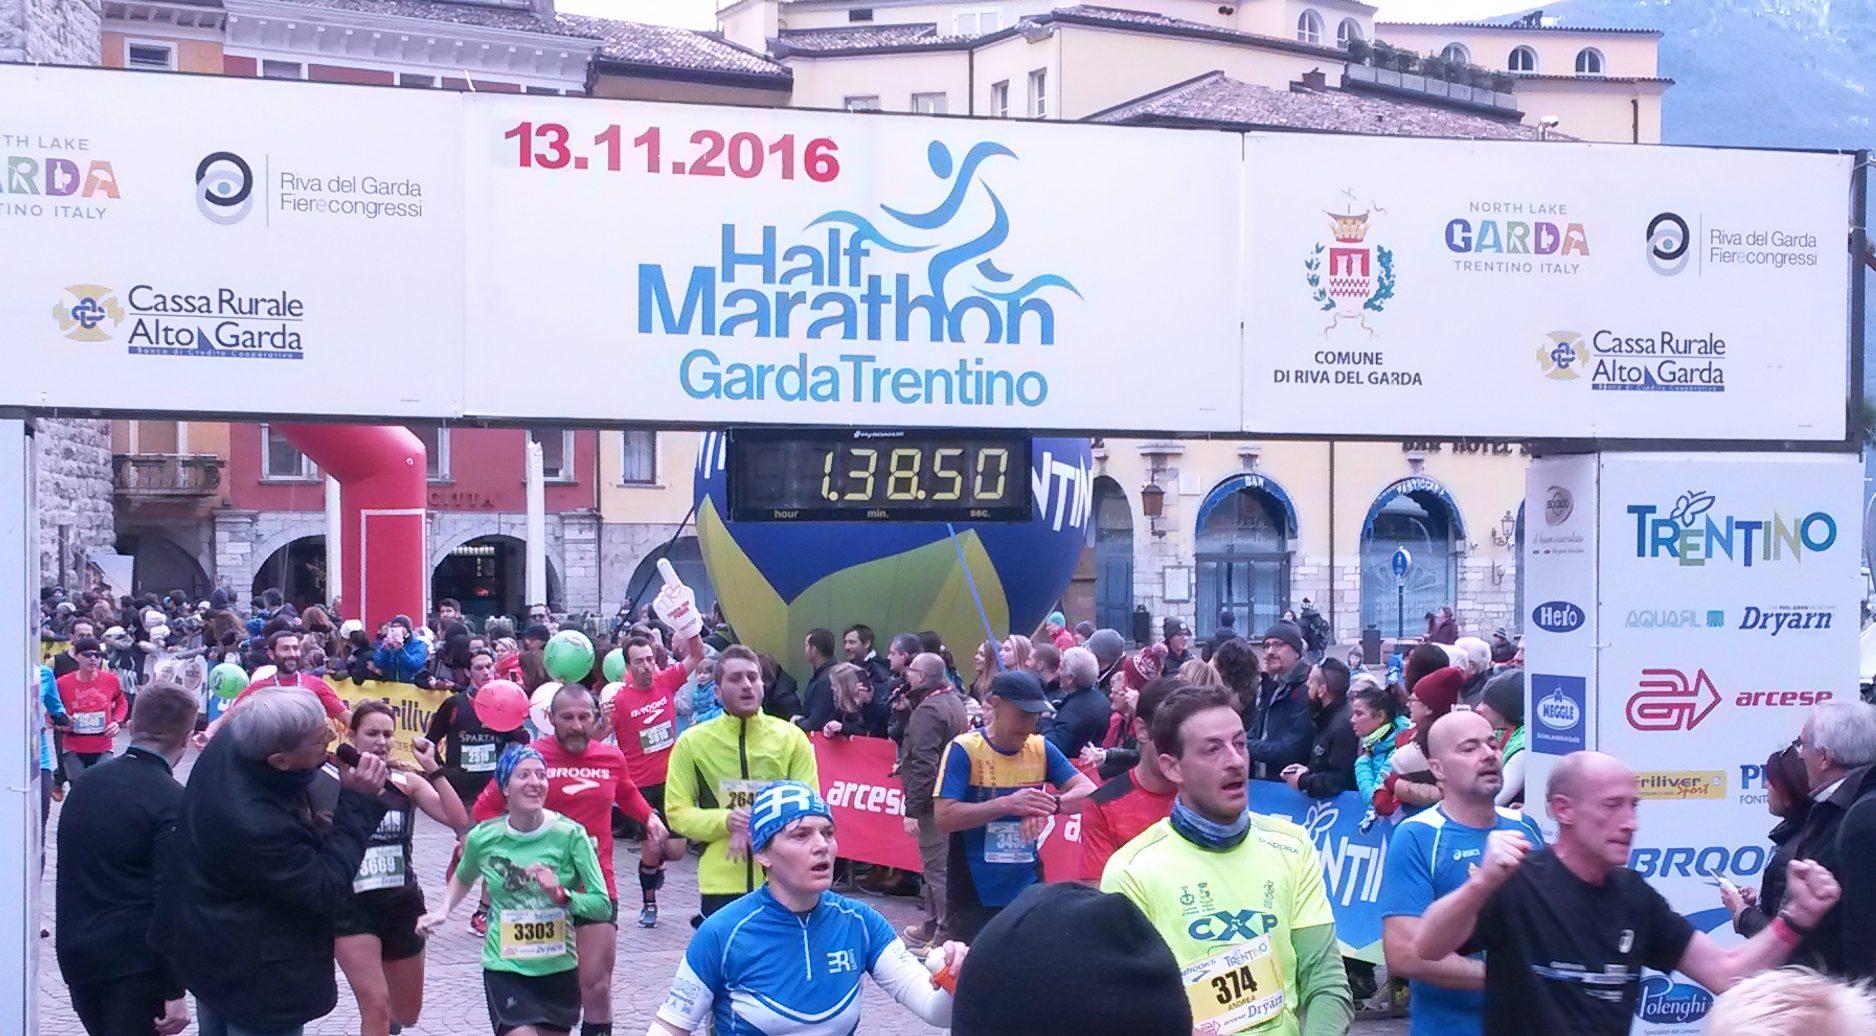 Arrivo Garda Trentino Half Marathon 2016